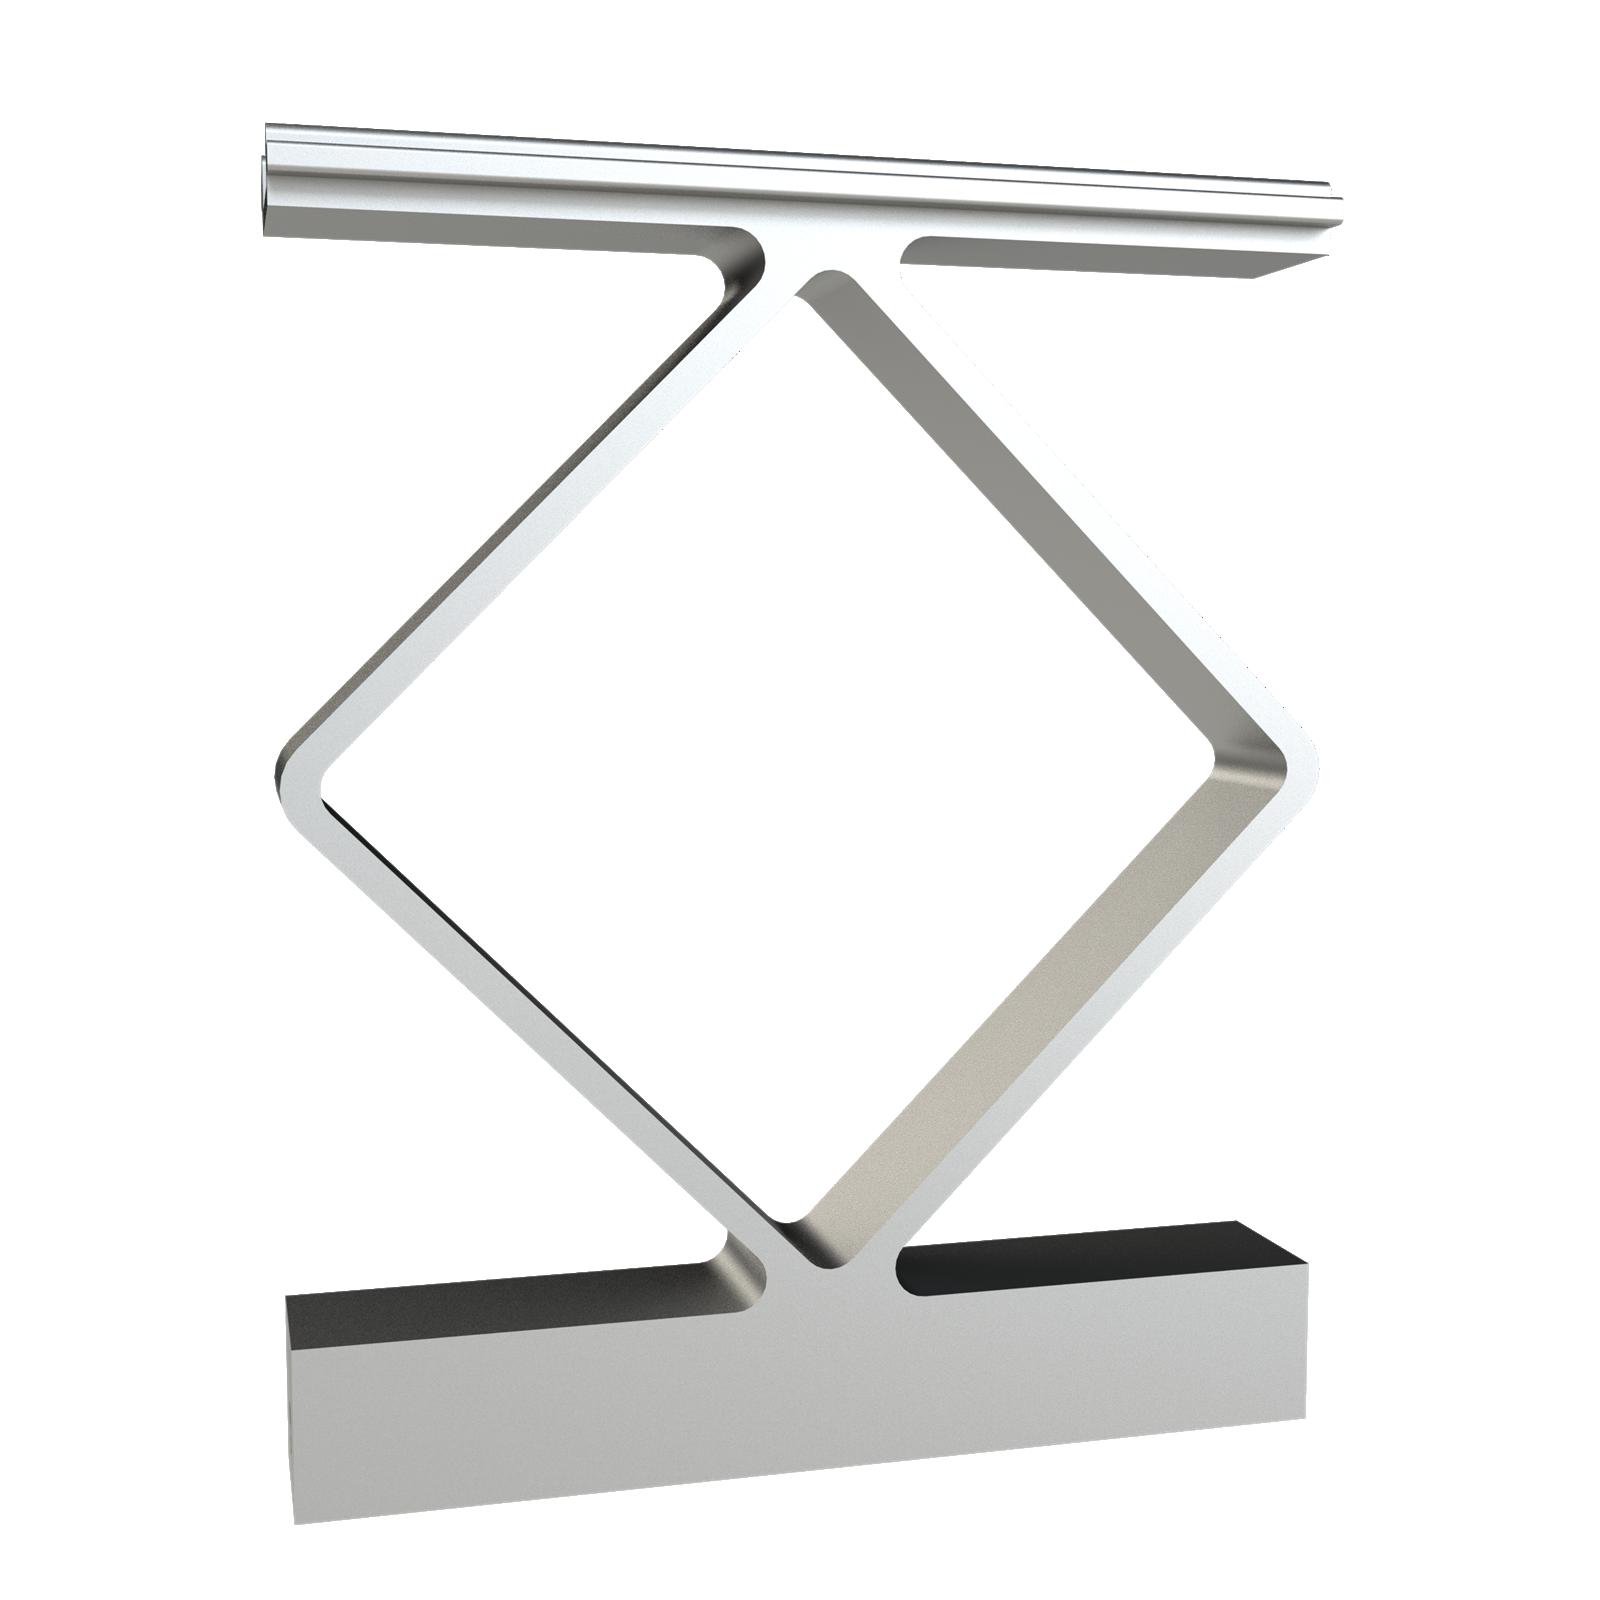 Peak Products Silver Aluminium Balustrade Decorative Handrail Spacer - 4 Pack